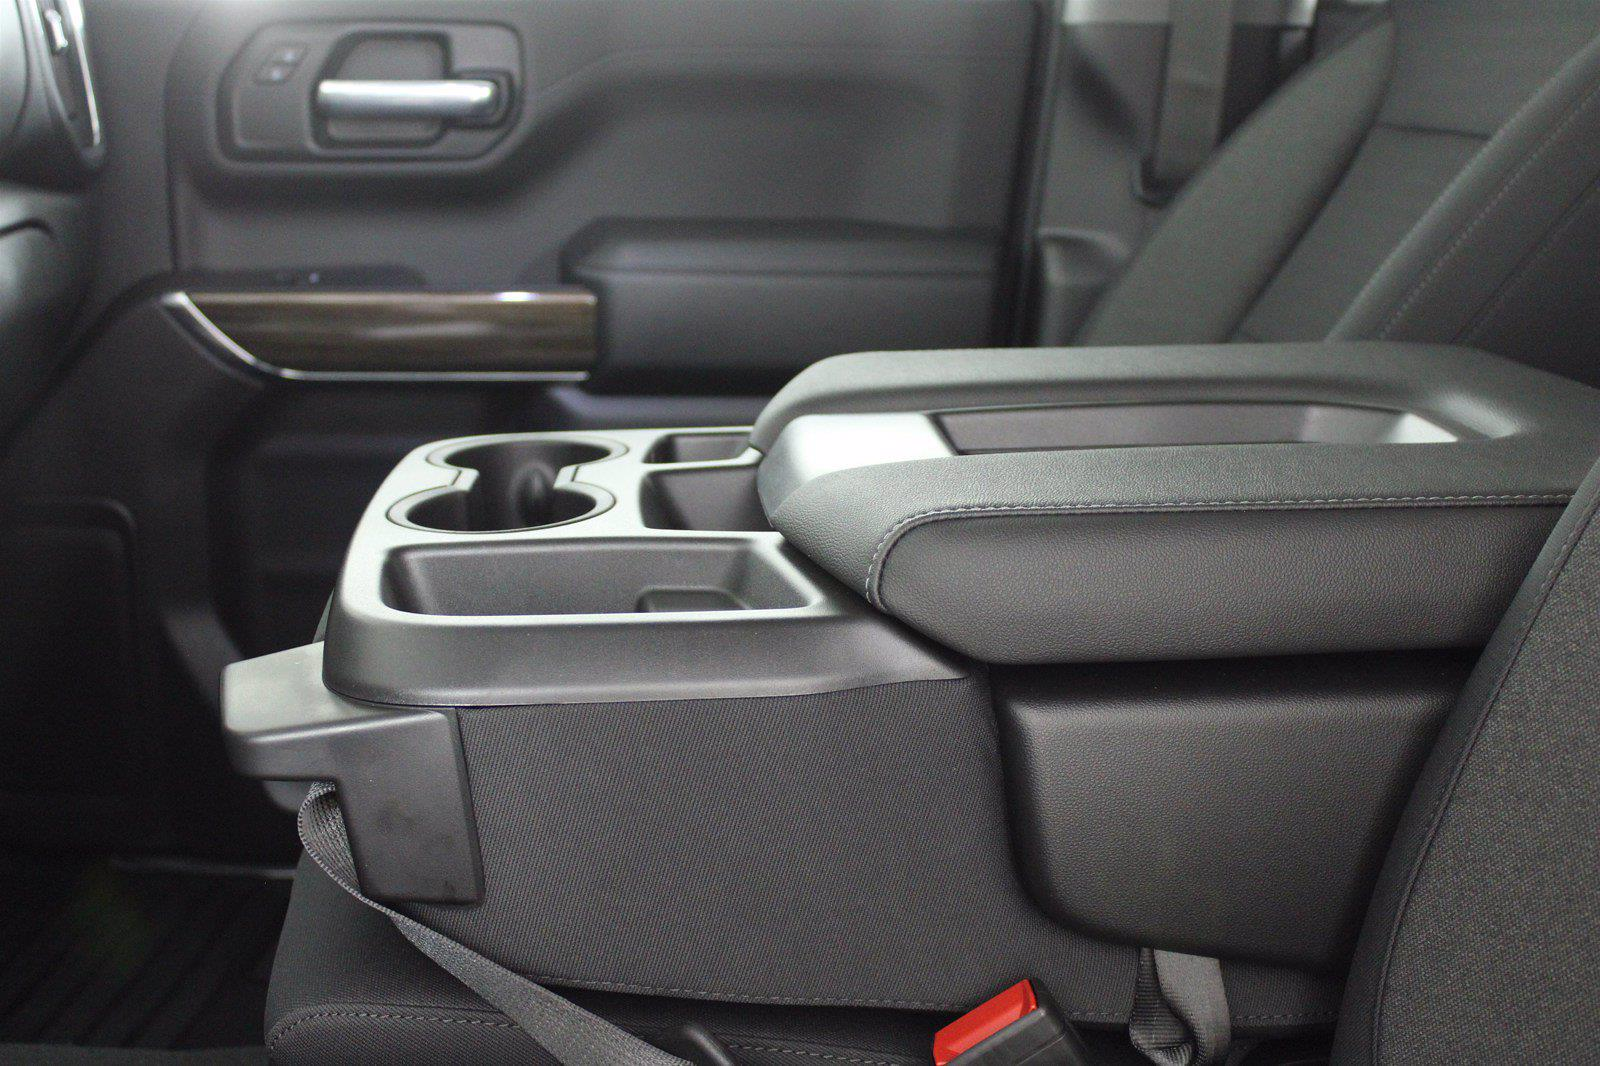 2021 Chevrolet Silverado 1500 Crew Cab 4x4, Pickup #D111137 - photo 13